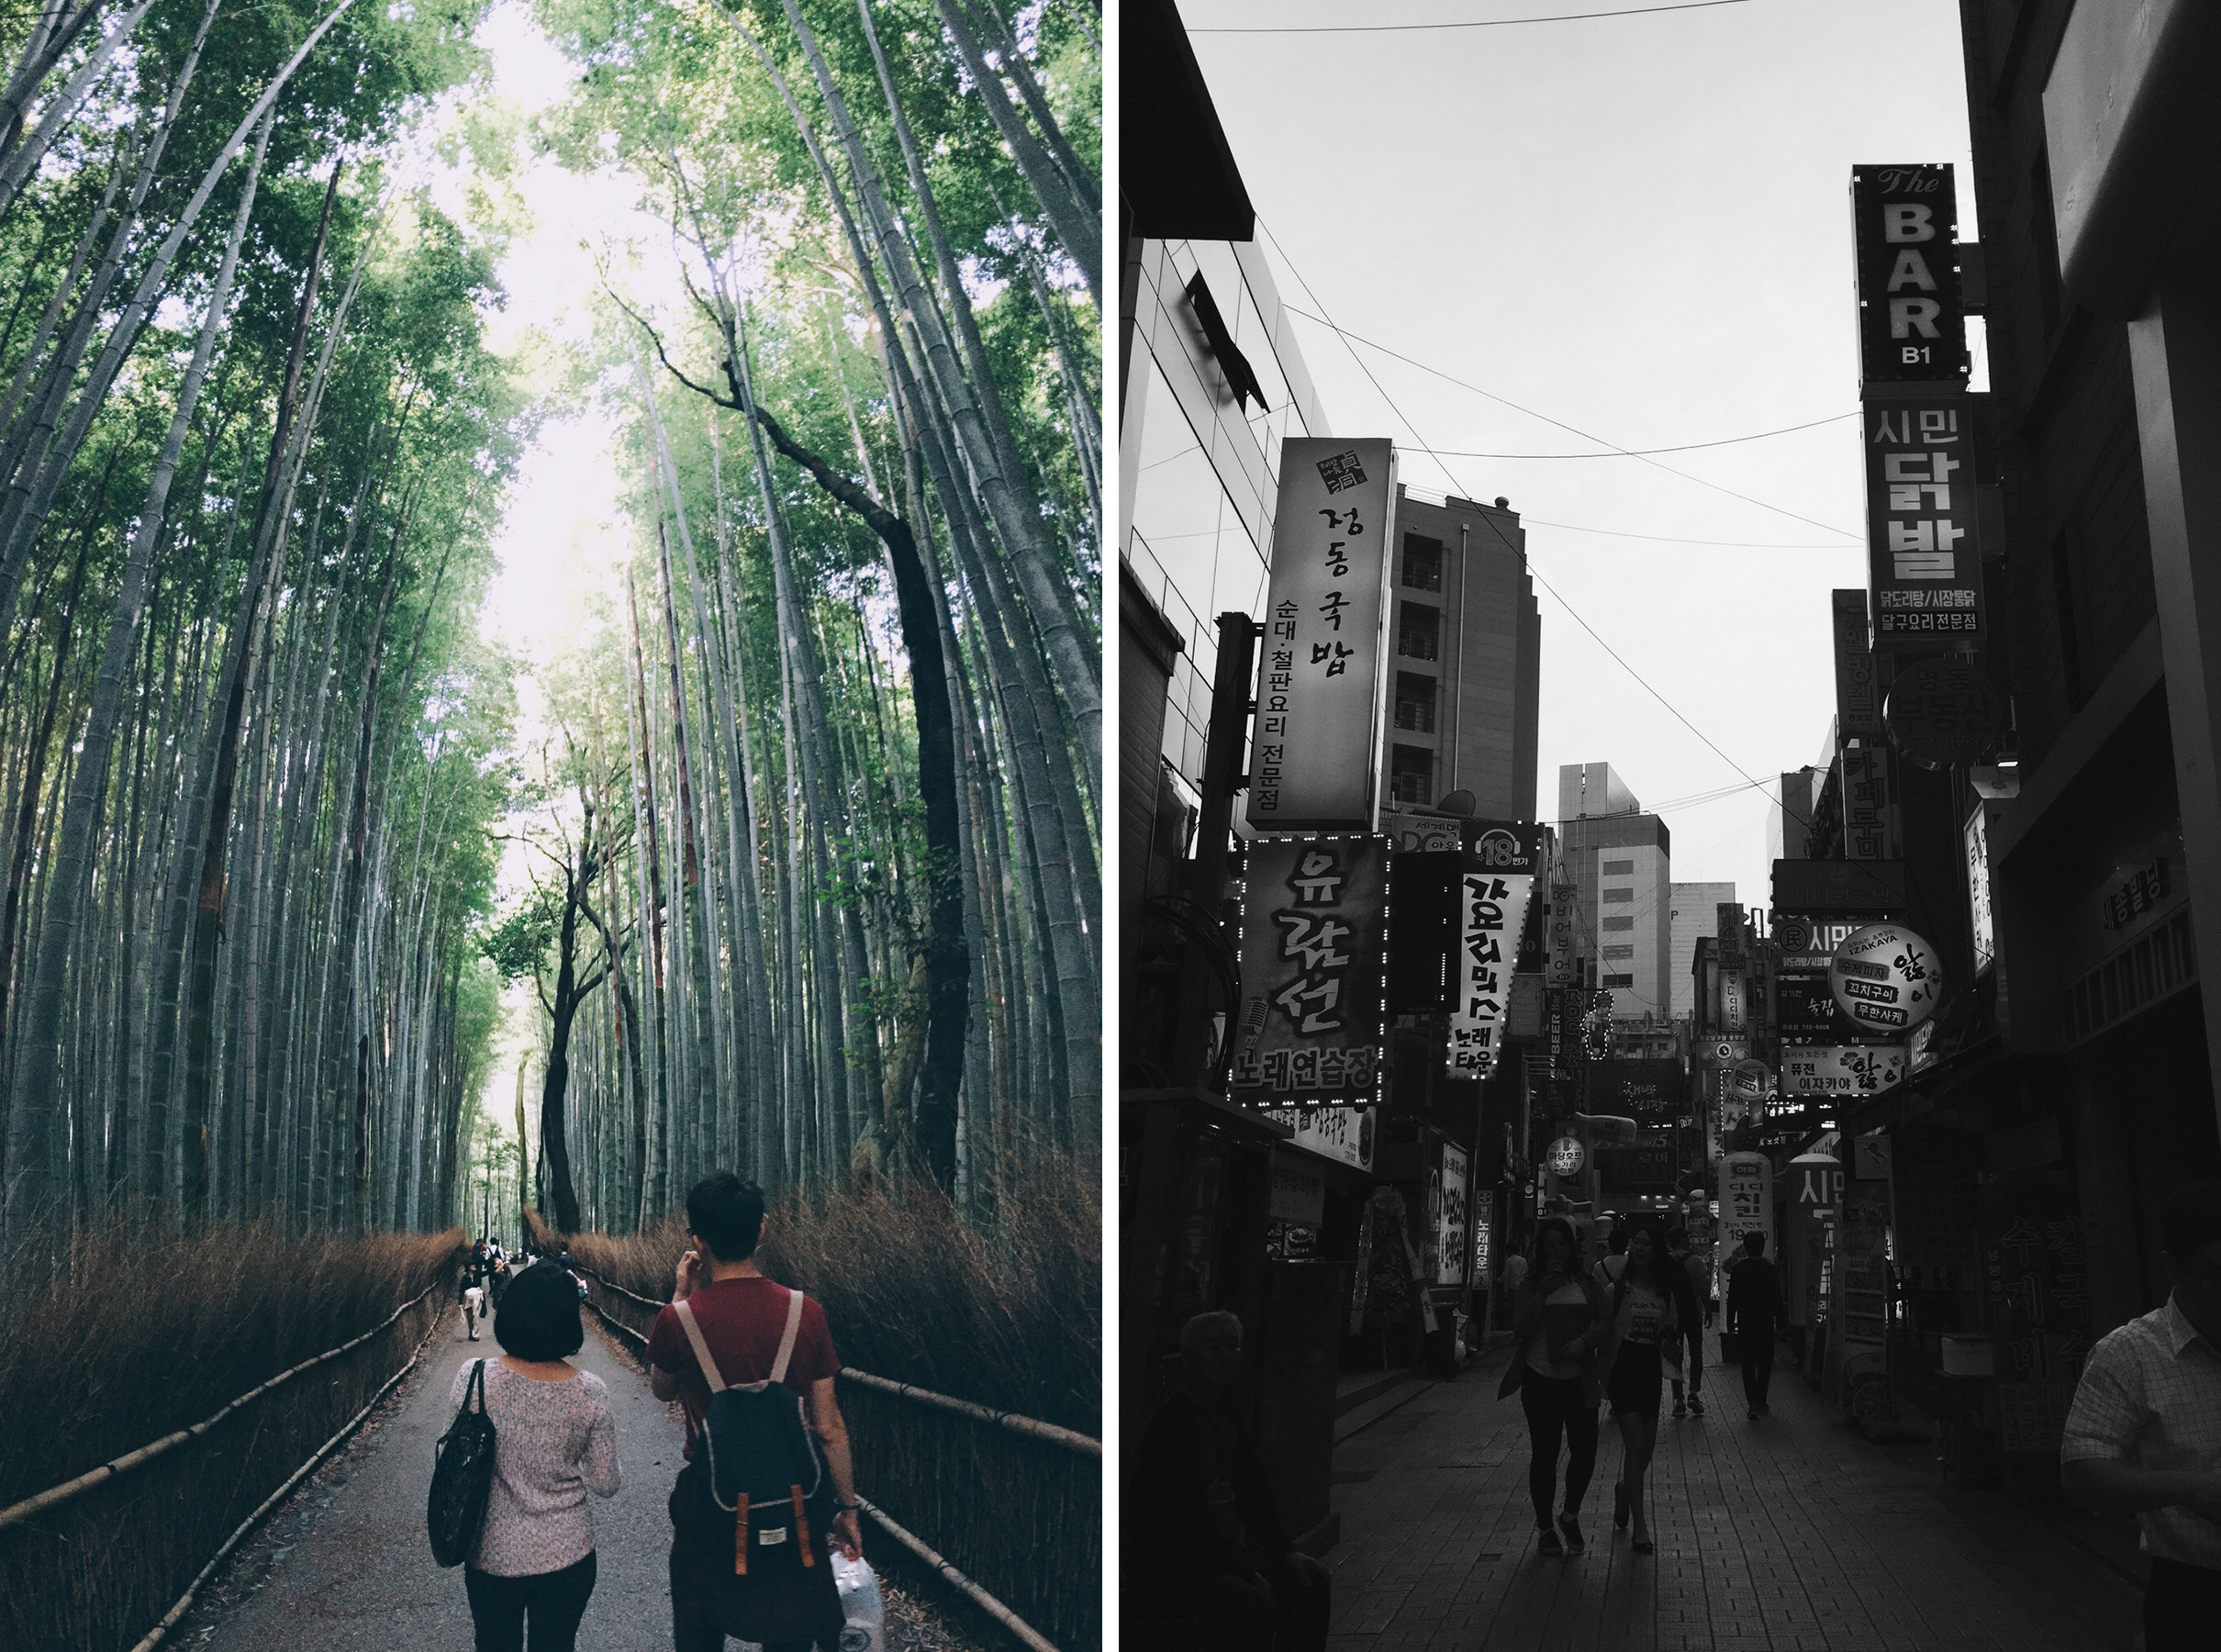 Arashiyama Bamboo Forest, Kyoto, Japan // Seoul, South Korea